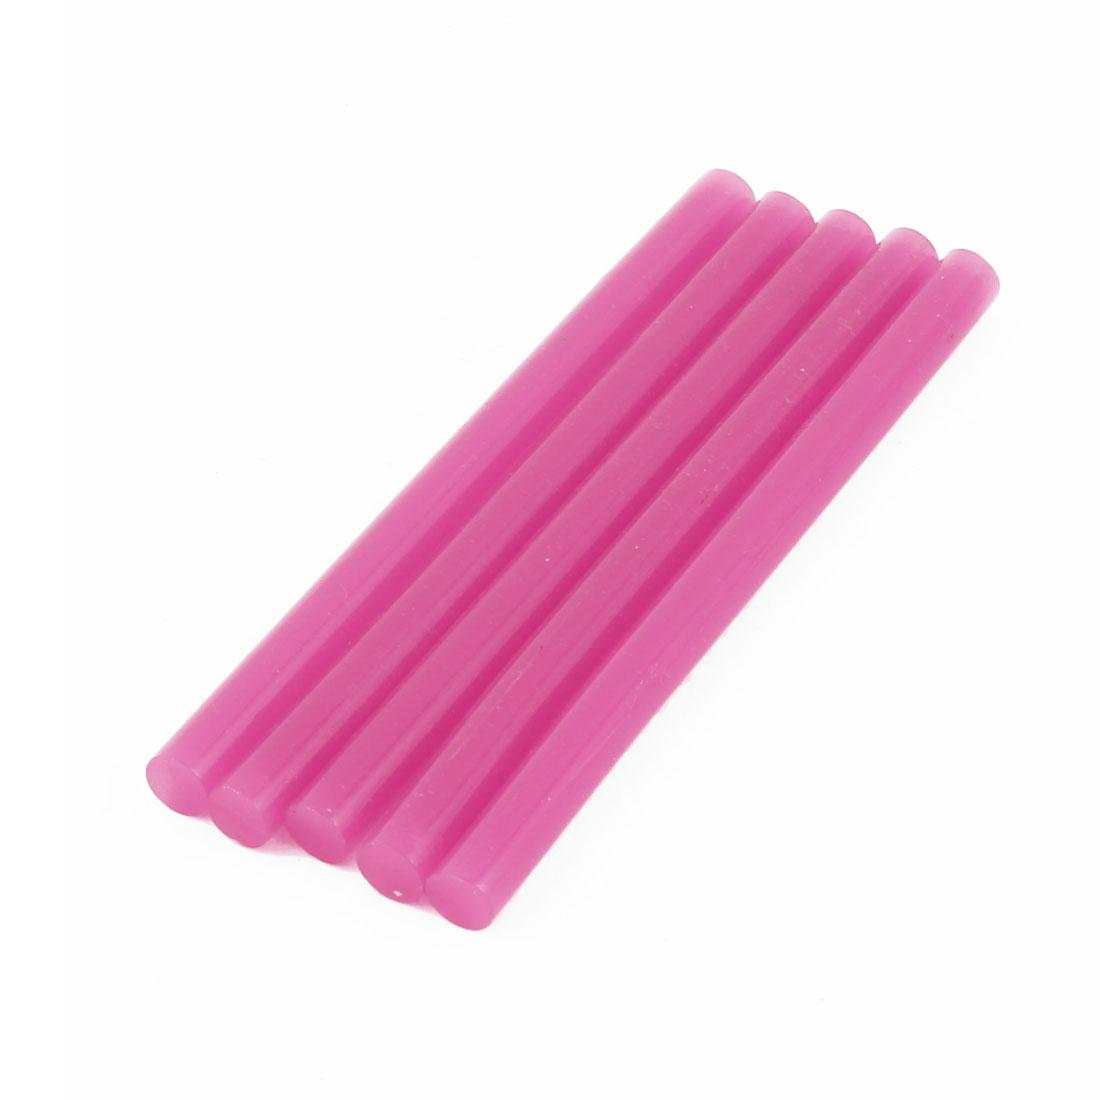 5pcs 100 x 7mm Rose Red Hot Melt Glue Quick Stick for Electric Tool Heating Gun